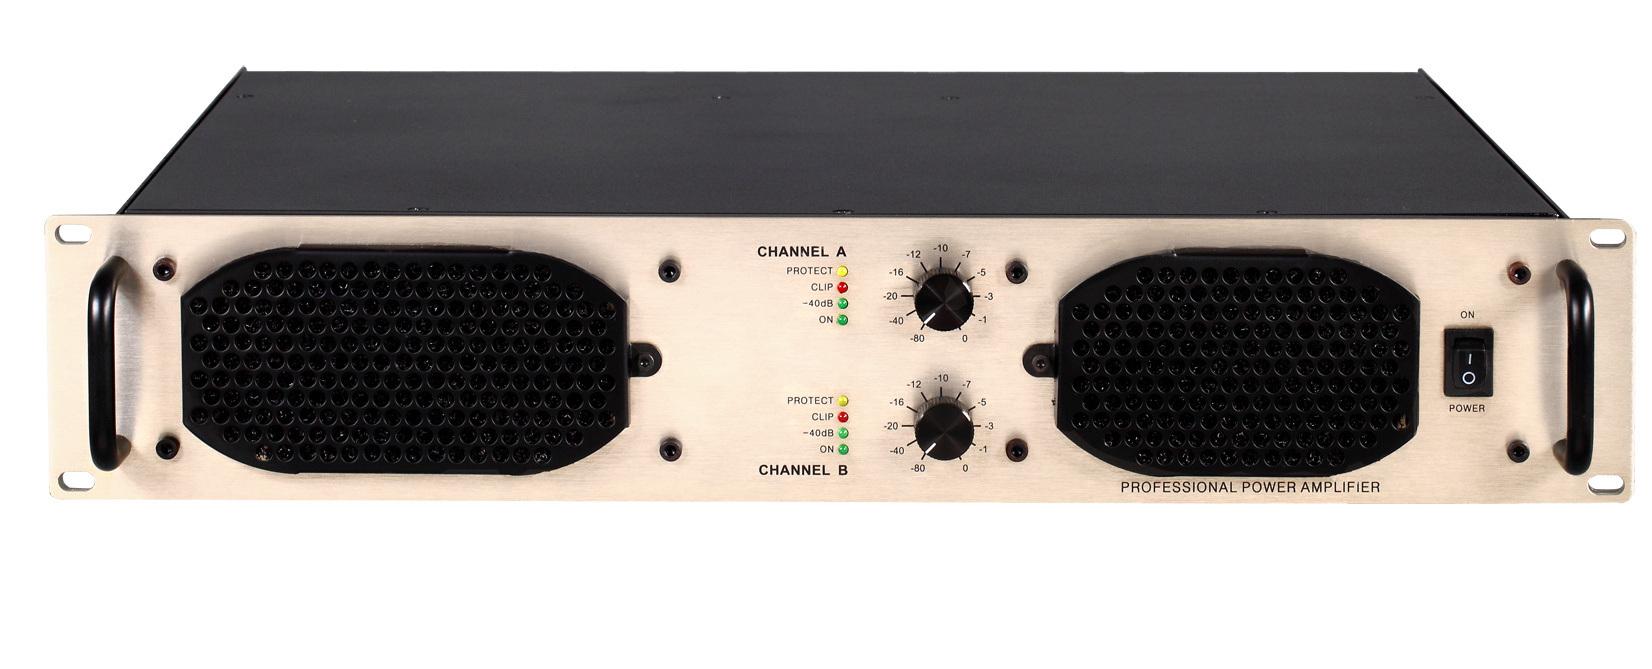 Ma Series, High Power Professional Amplifier, 2u Standard Cabinet